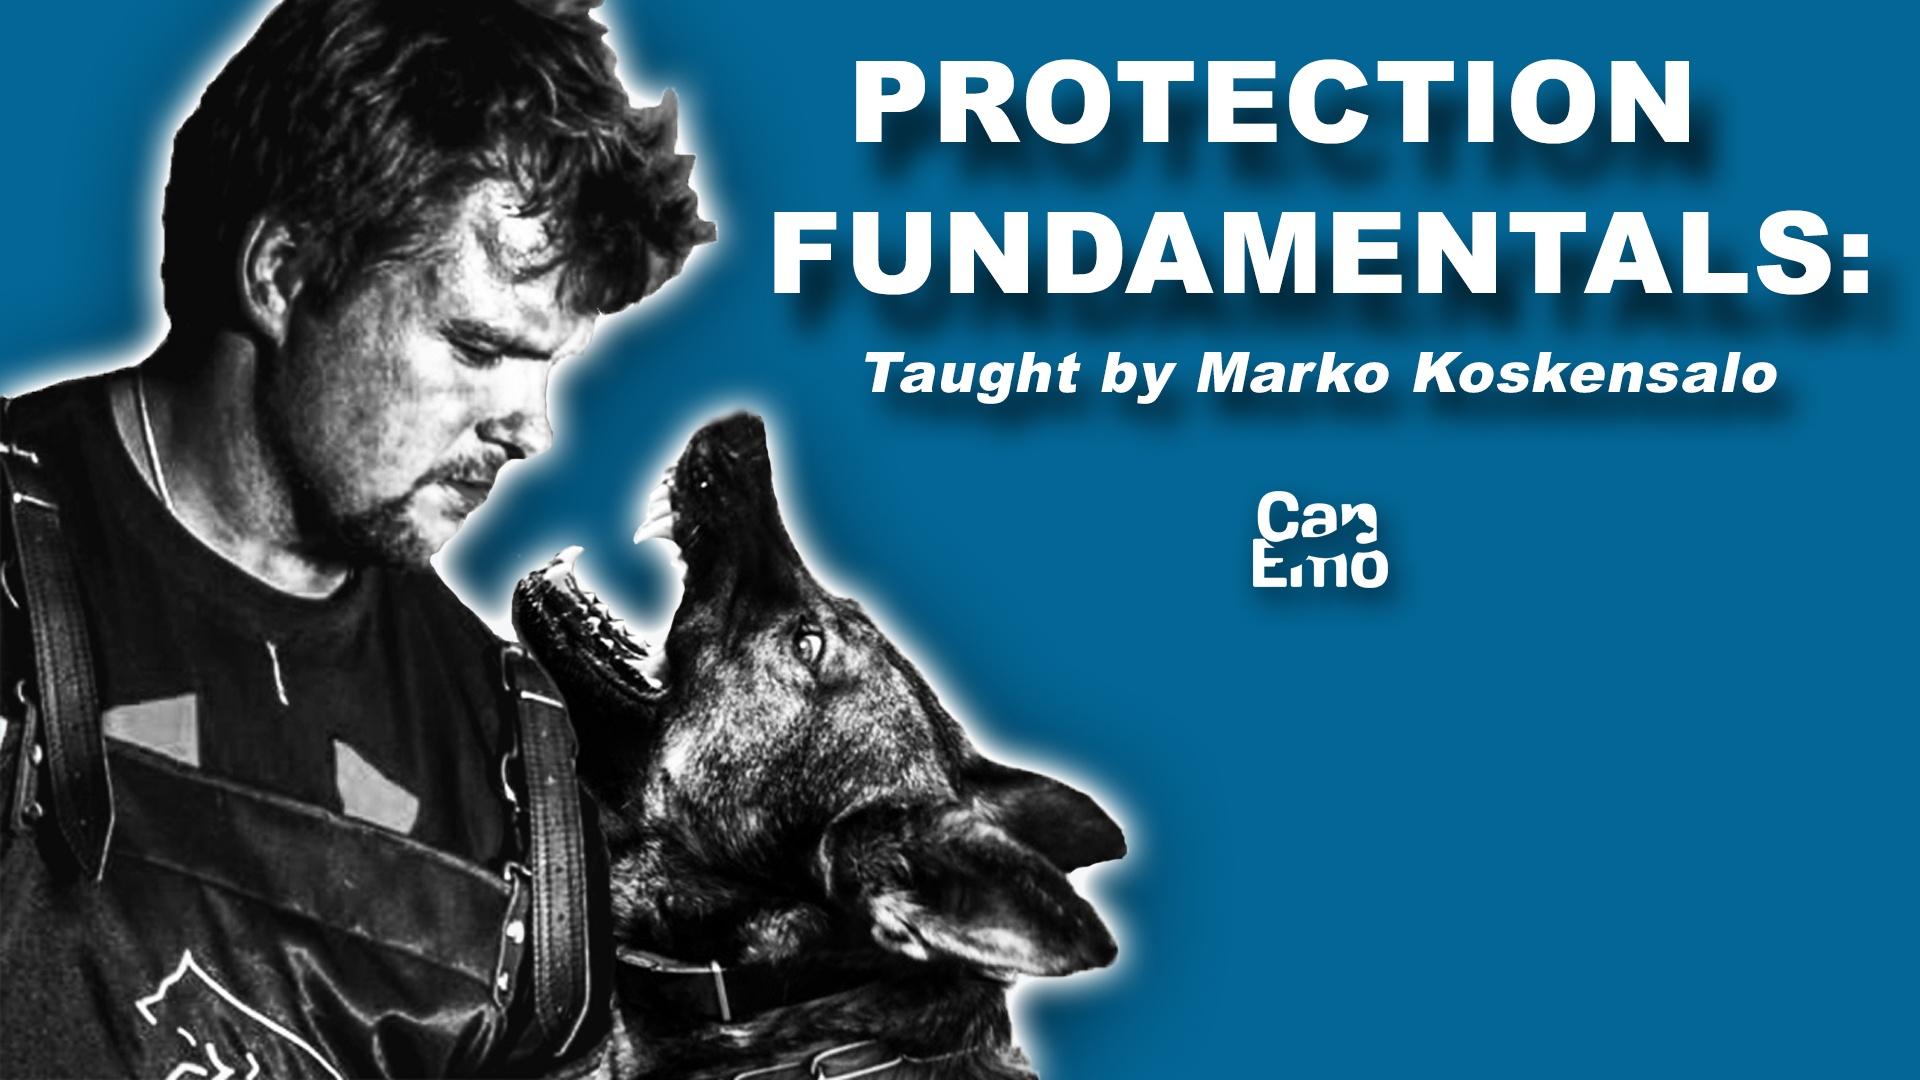 Protection Fundamentals